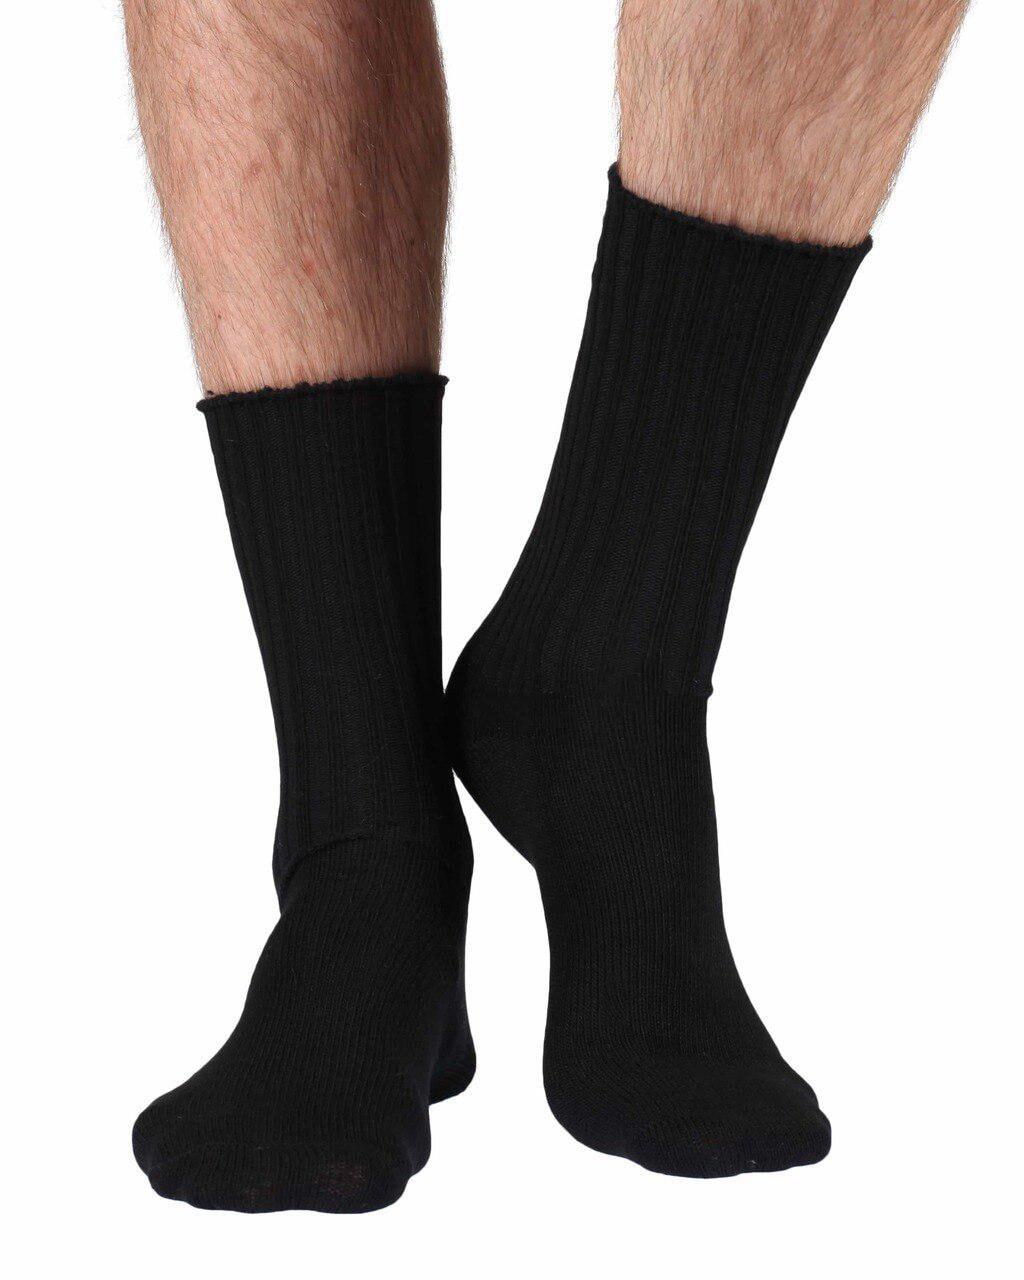 soft topped Fremont women/'s elastic free cotton crew socks in sky blue